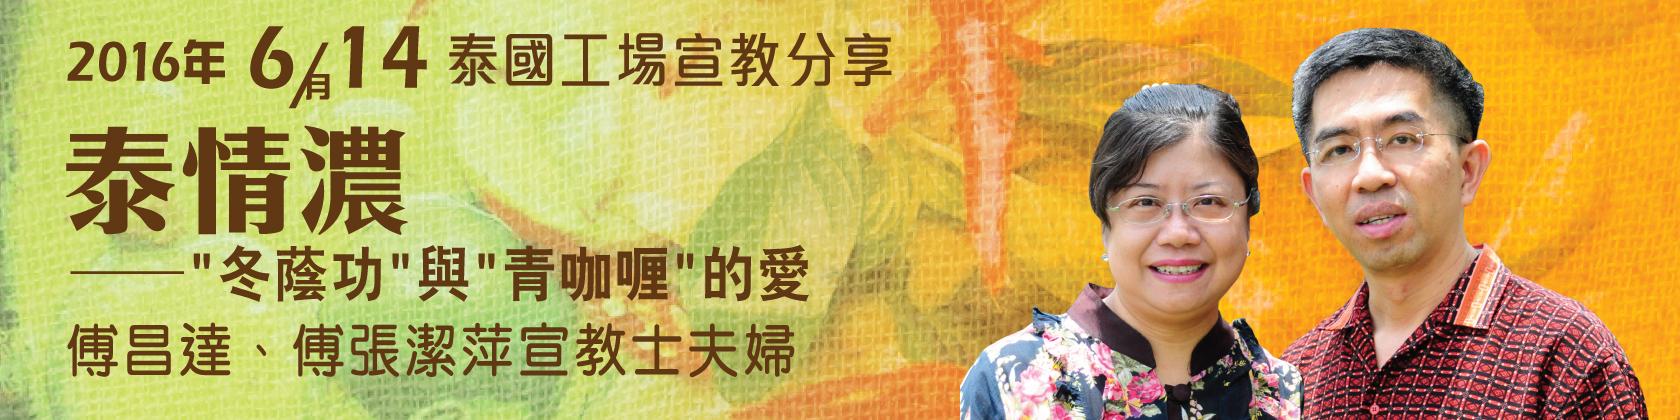 CB-宣教分享會-web-banner-1680-x-420-01